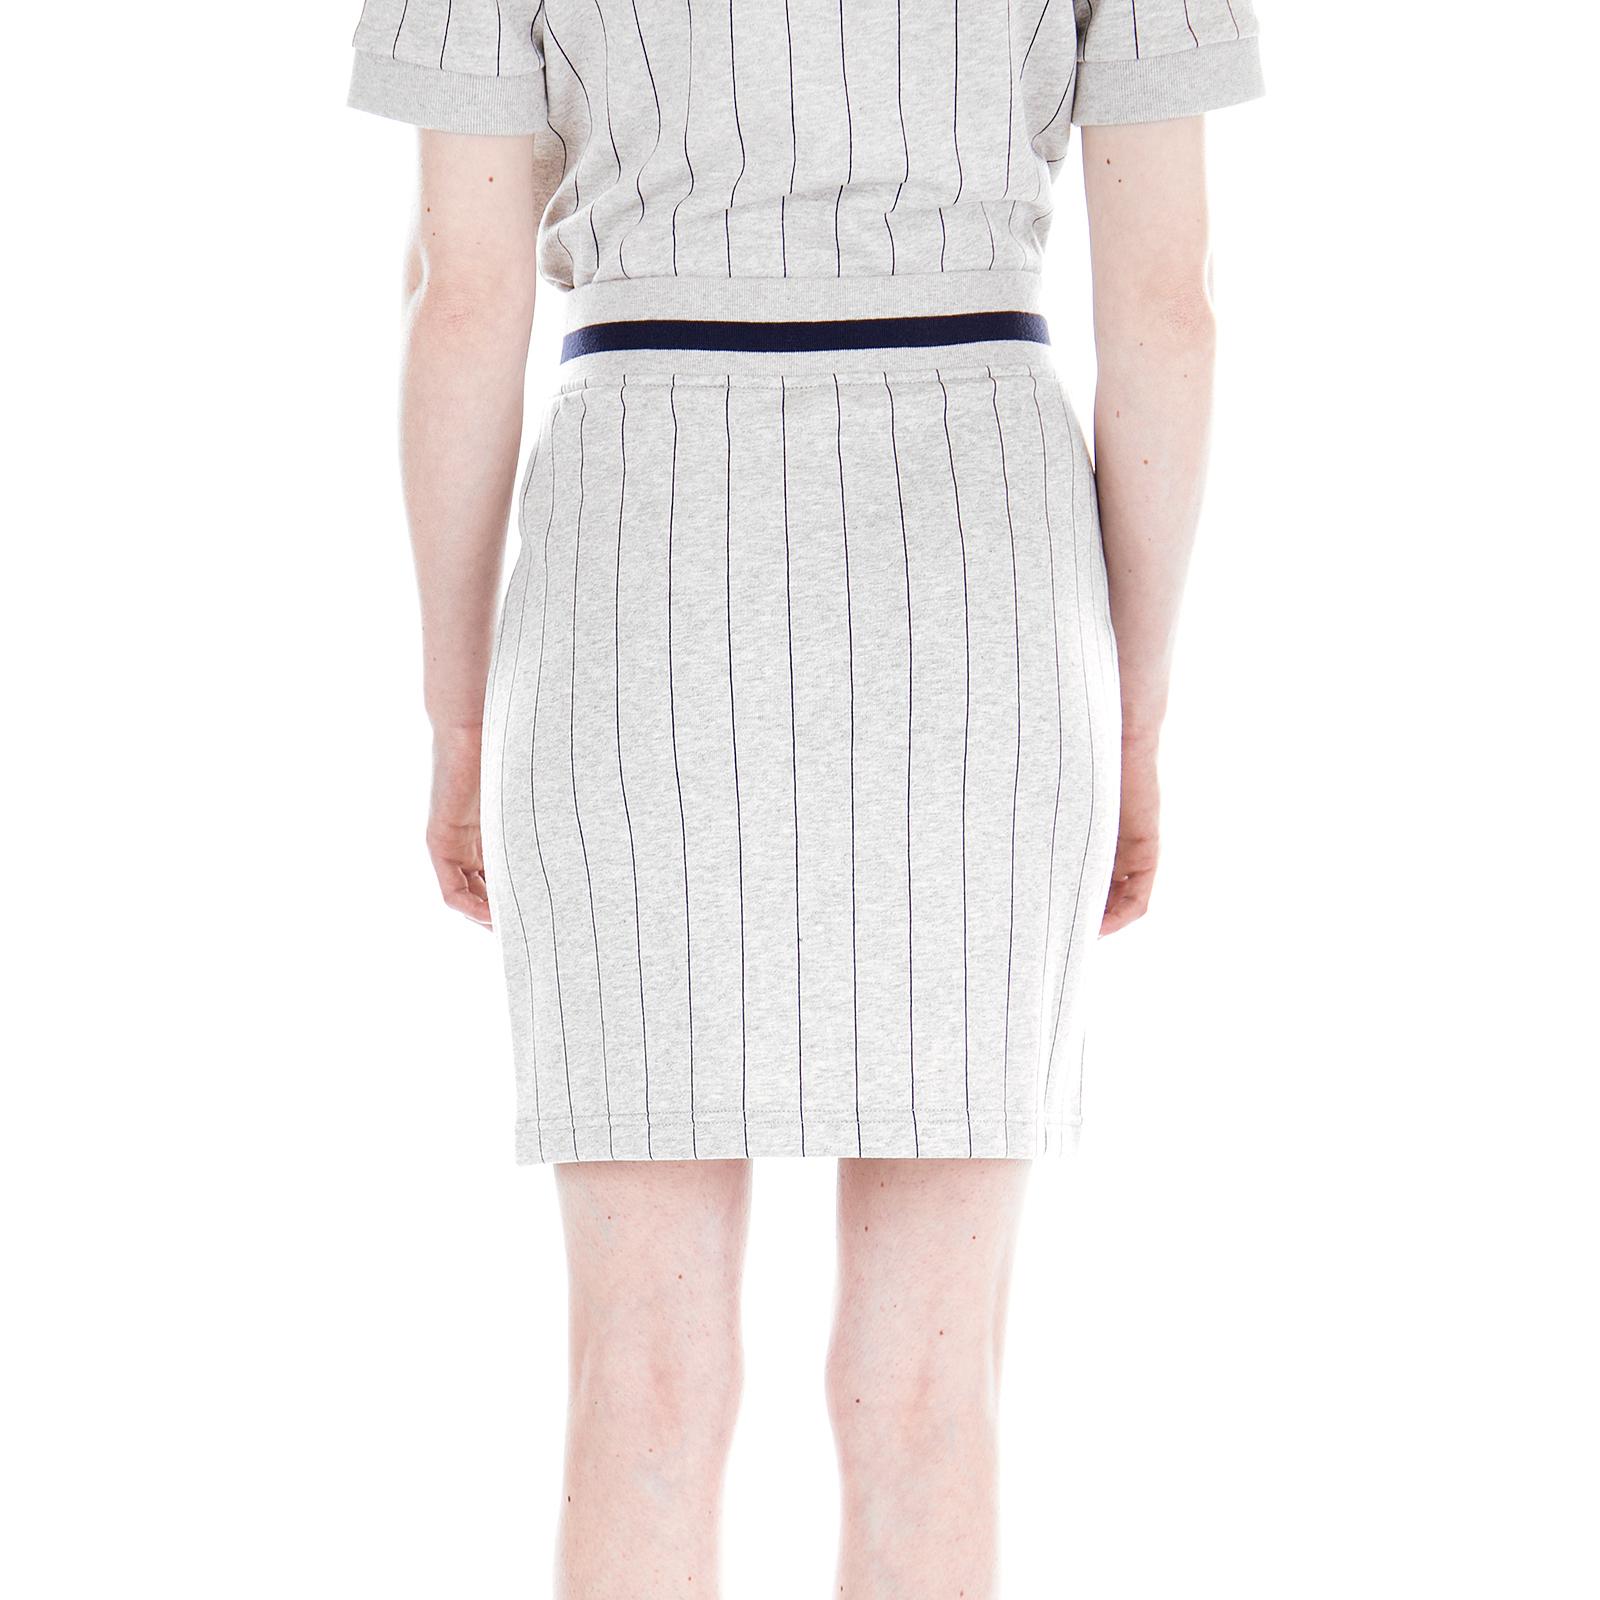 8ac7e61b8 Fila Skirts Francesca Skirt Light Grey Marl Pinstripe Grey | eBay